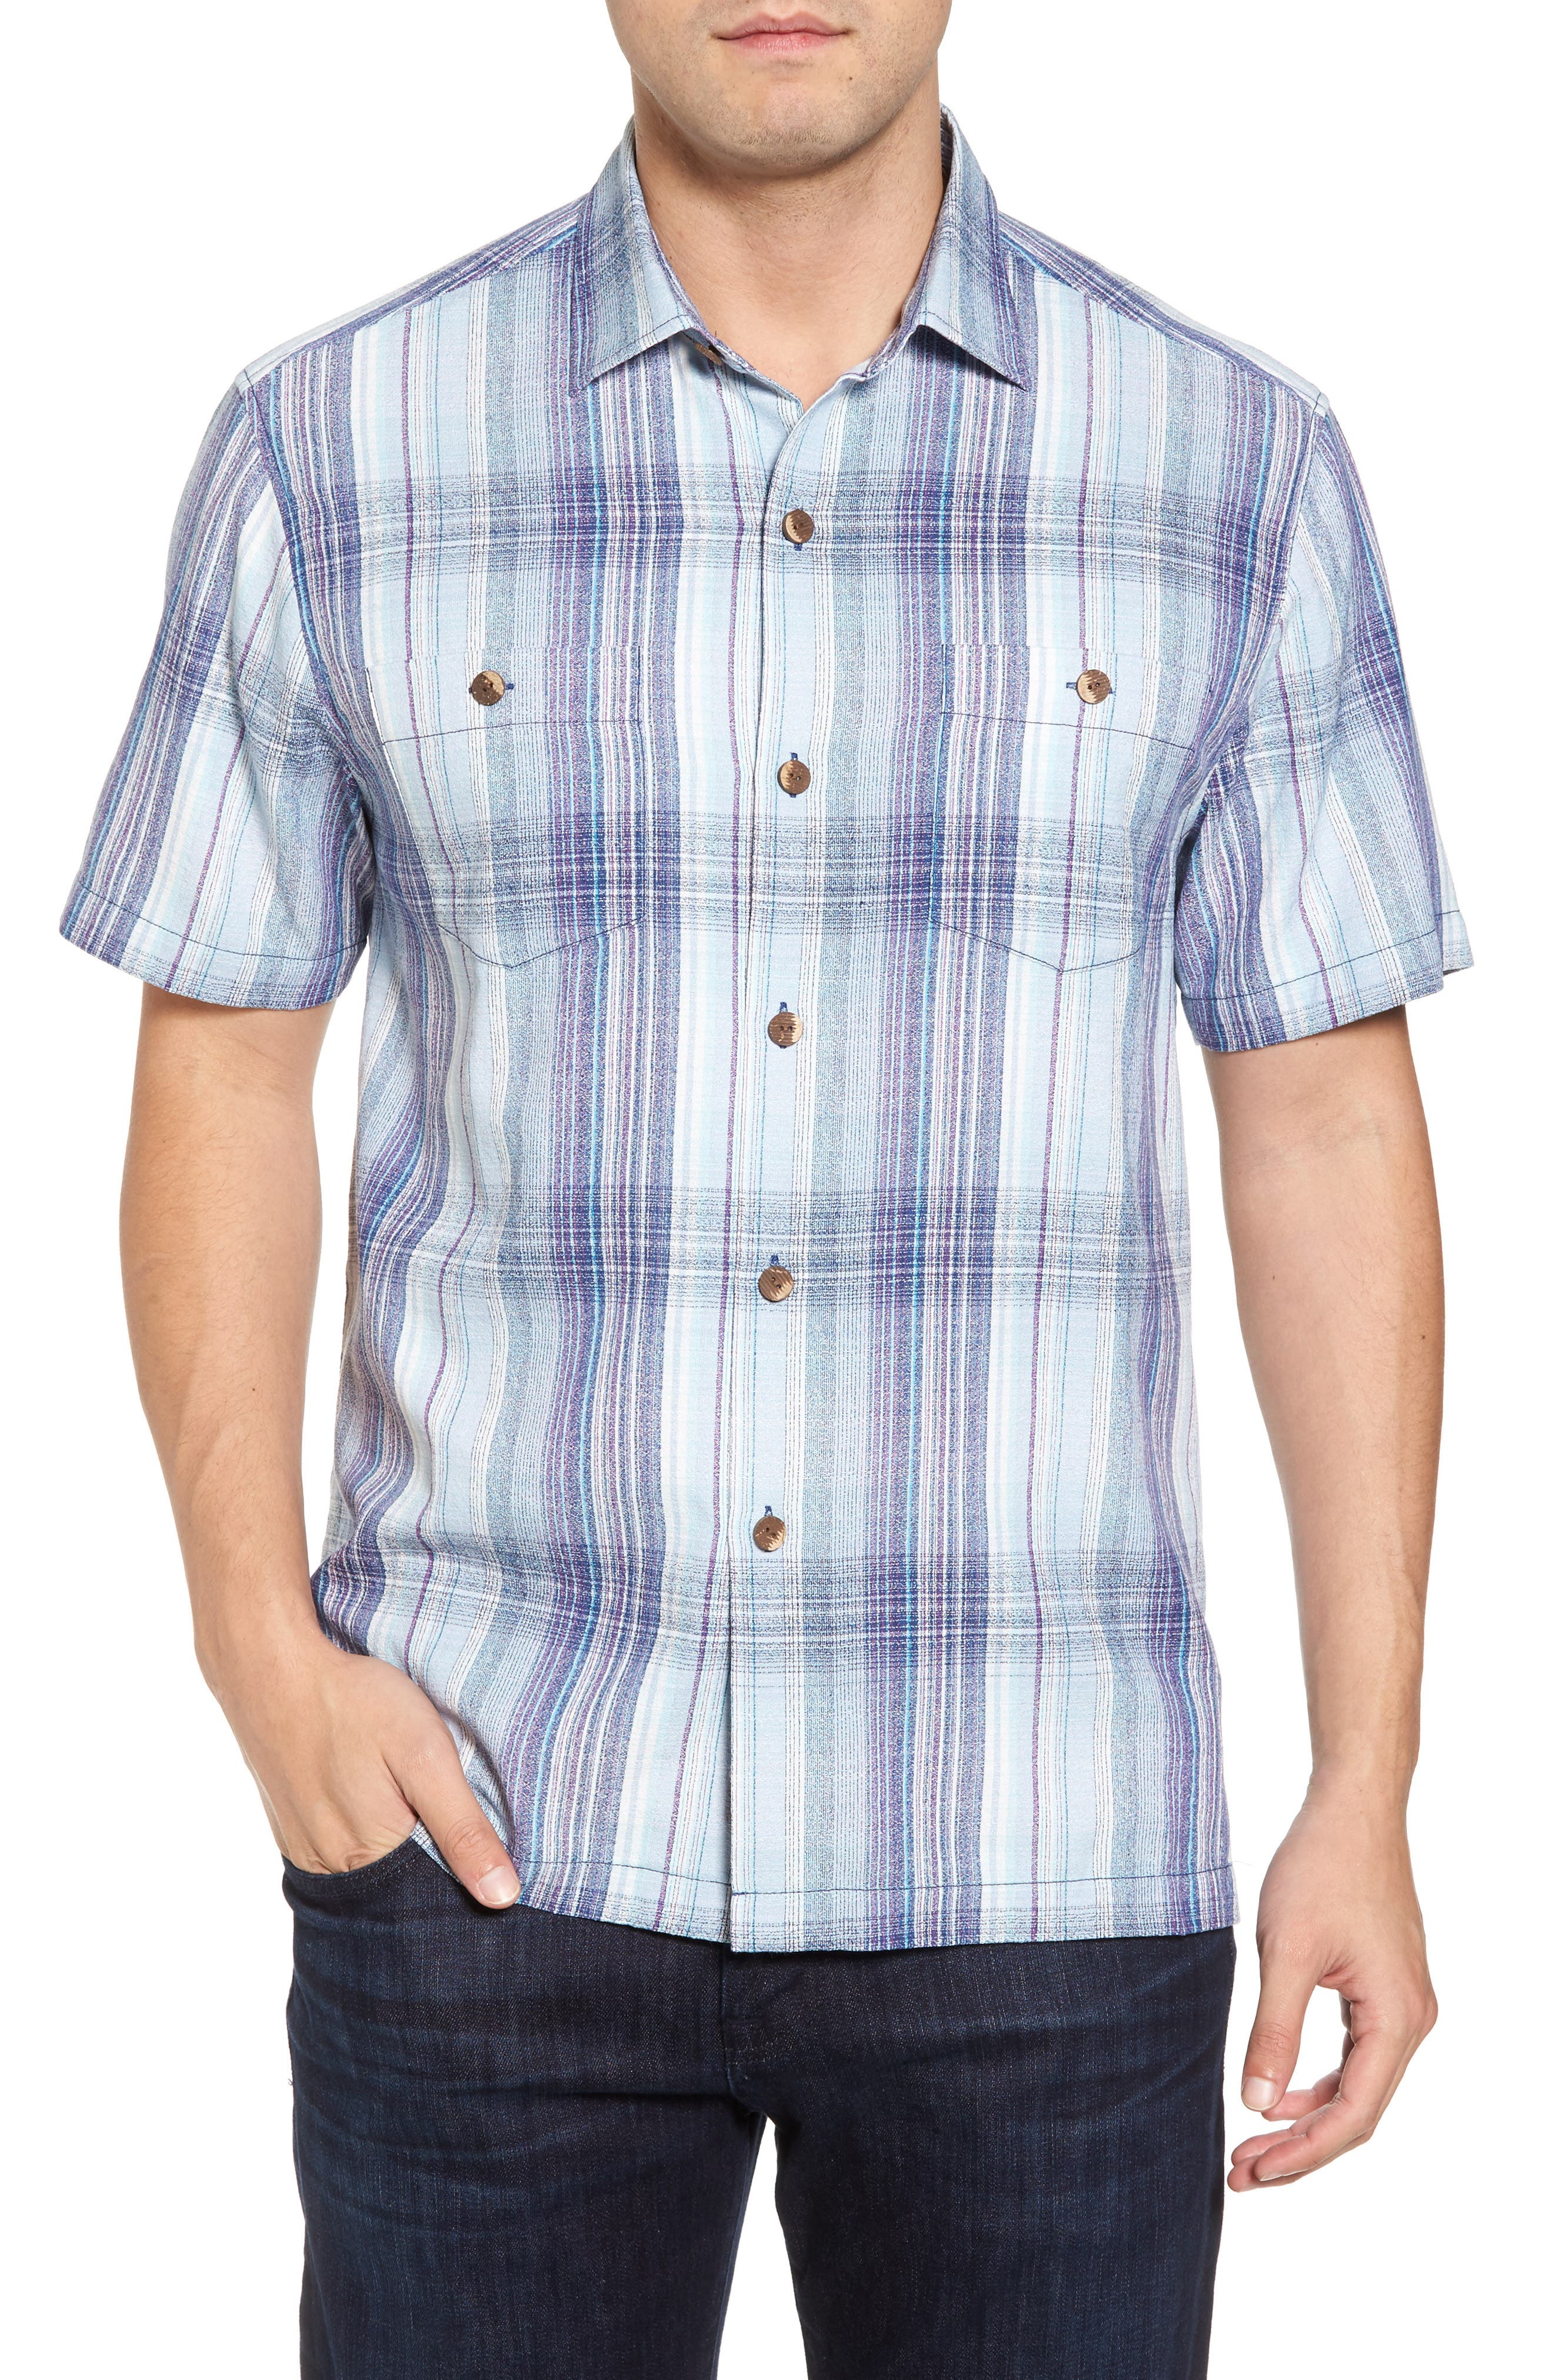 Banyan Cay Plaid Silk Blend Camp Shirt,                             Main thumbnail 1, color,                             Dockside Blue